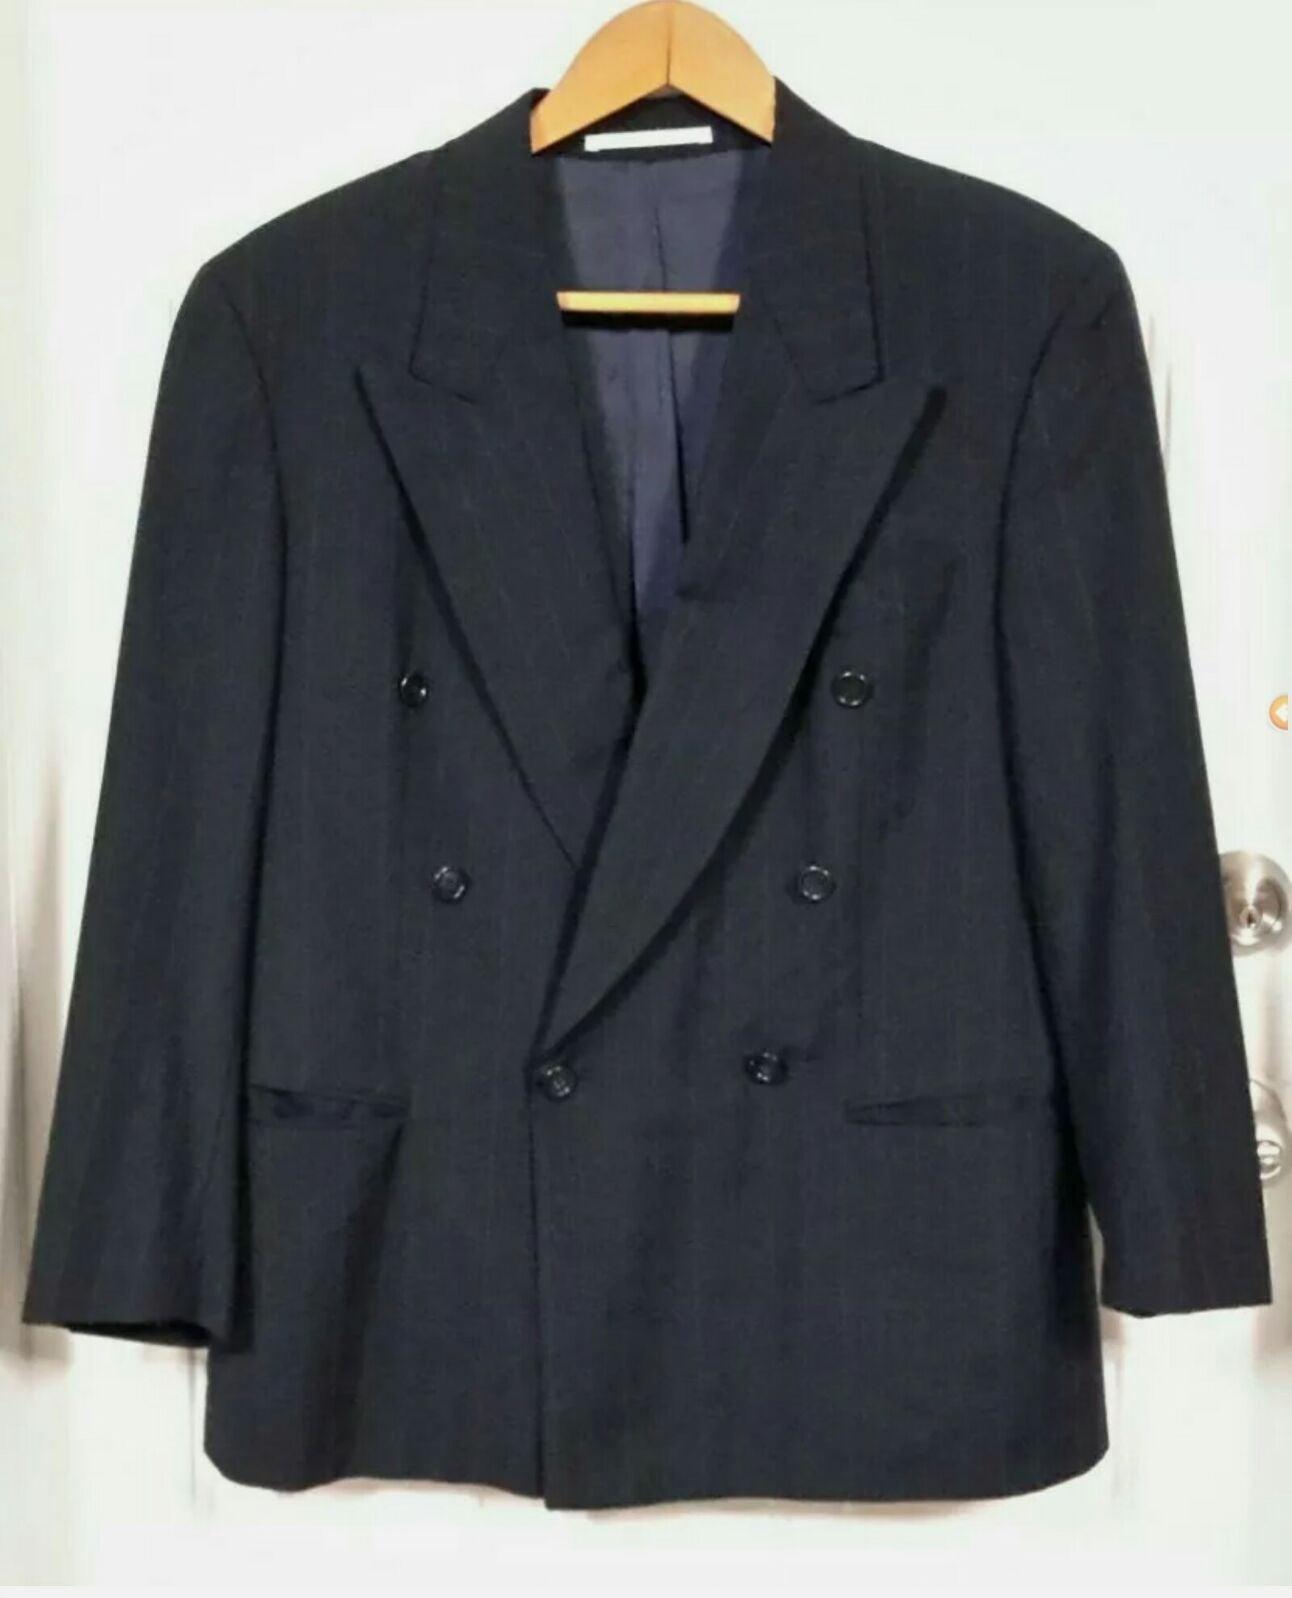 Hugo Boss Blazer Sport Coat Jacket 40R